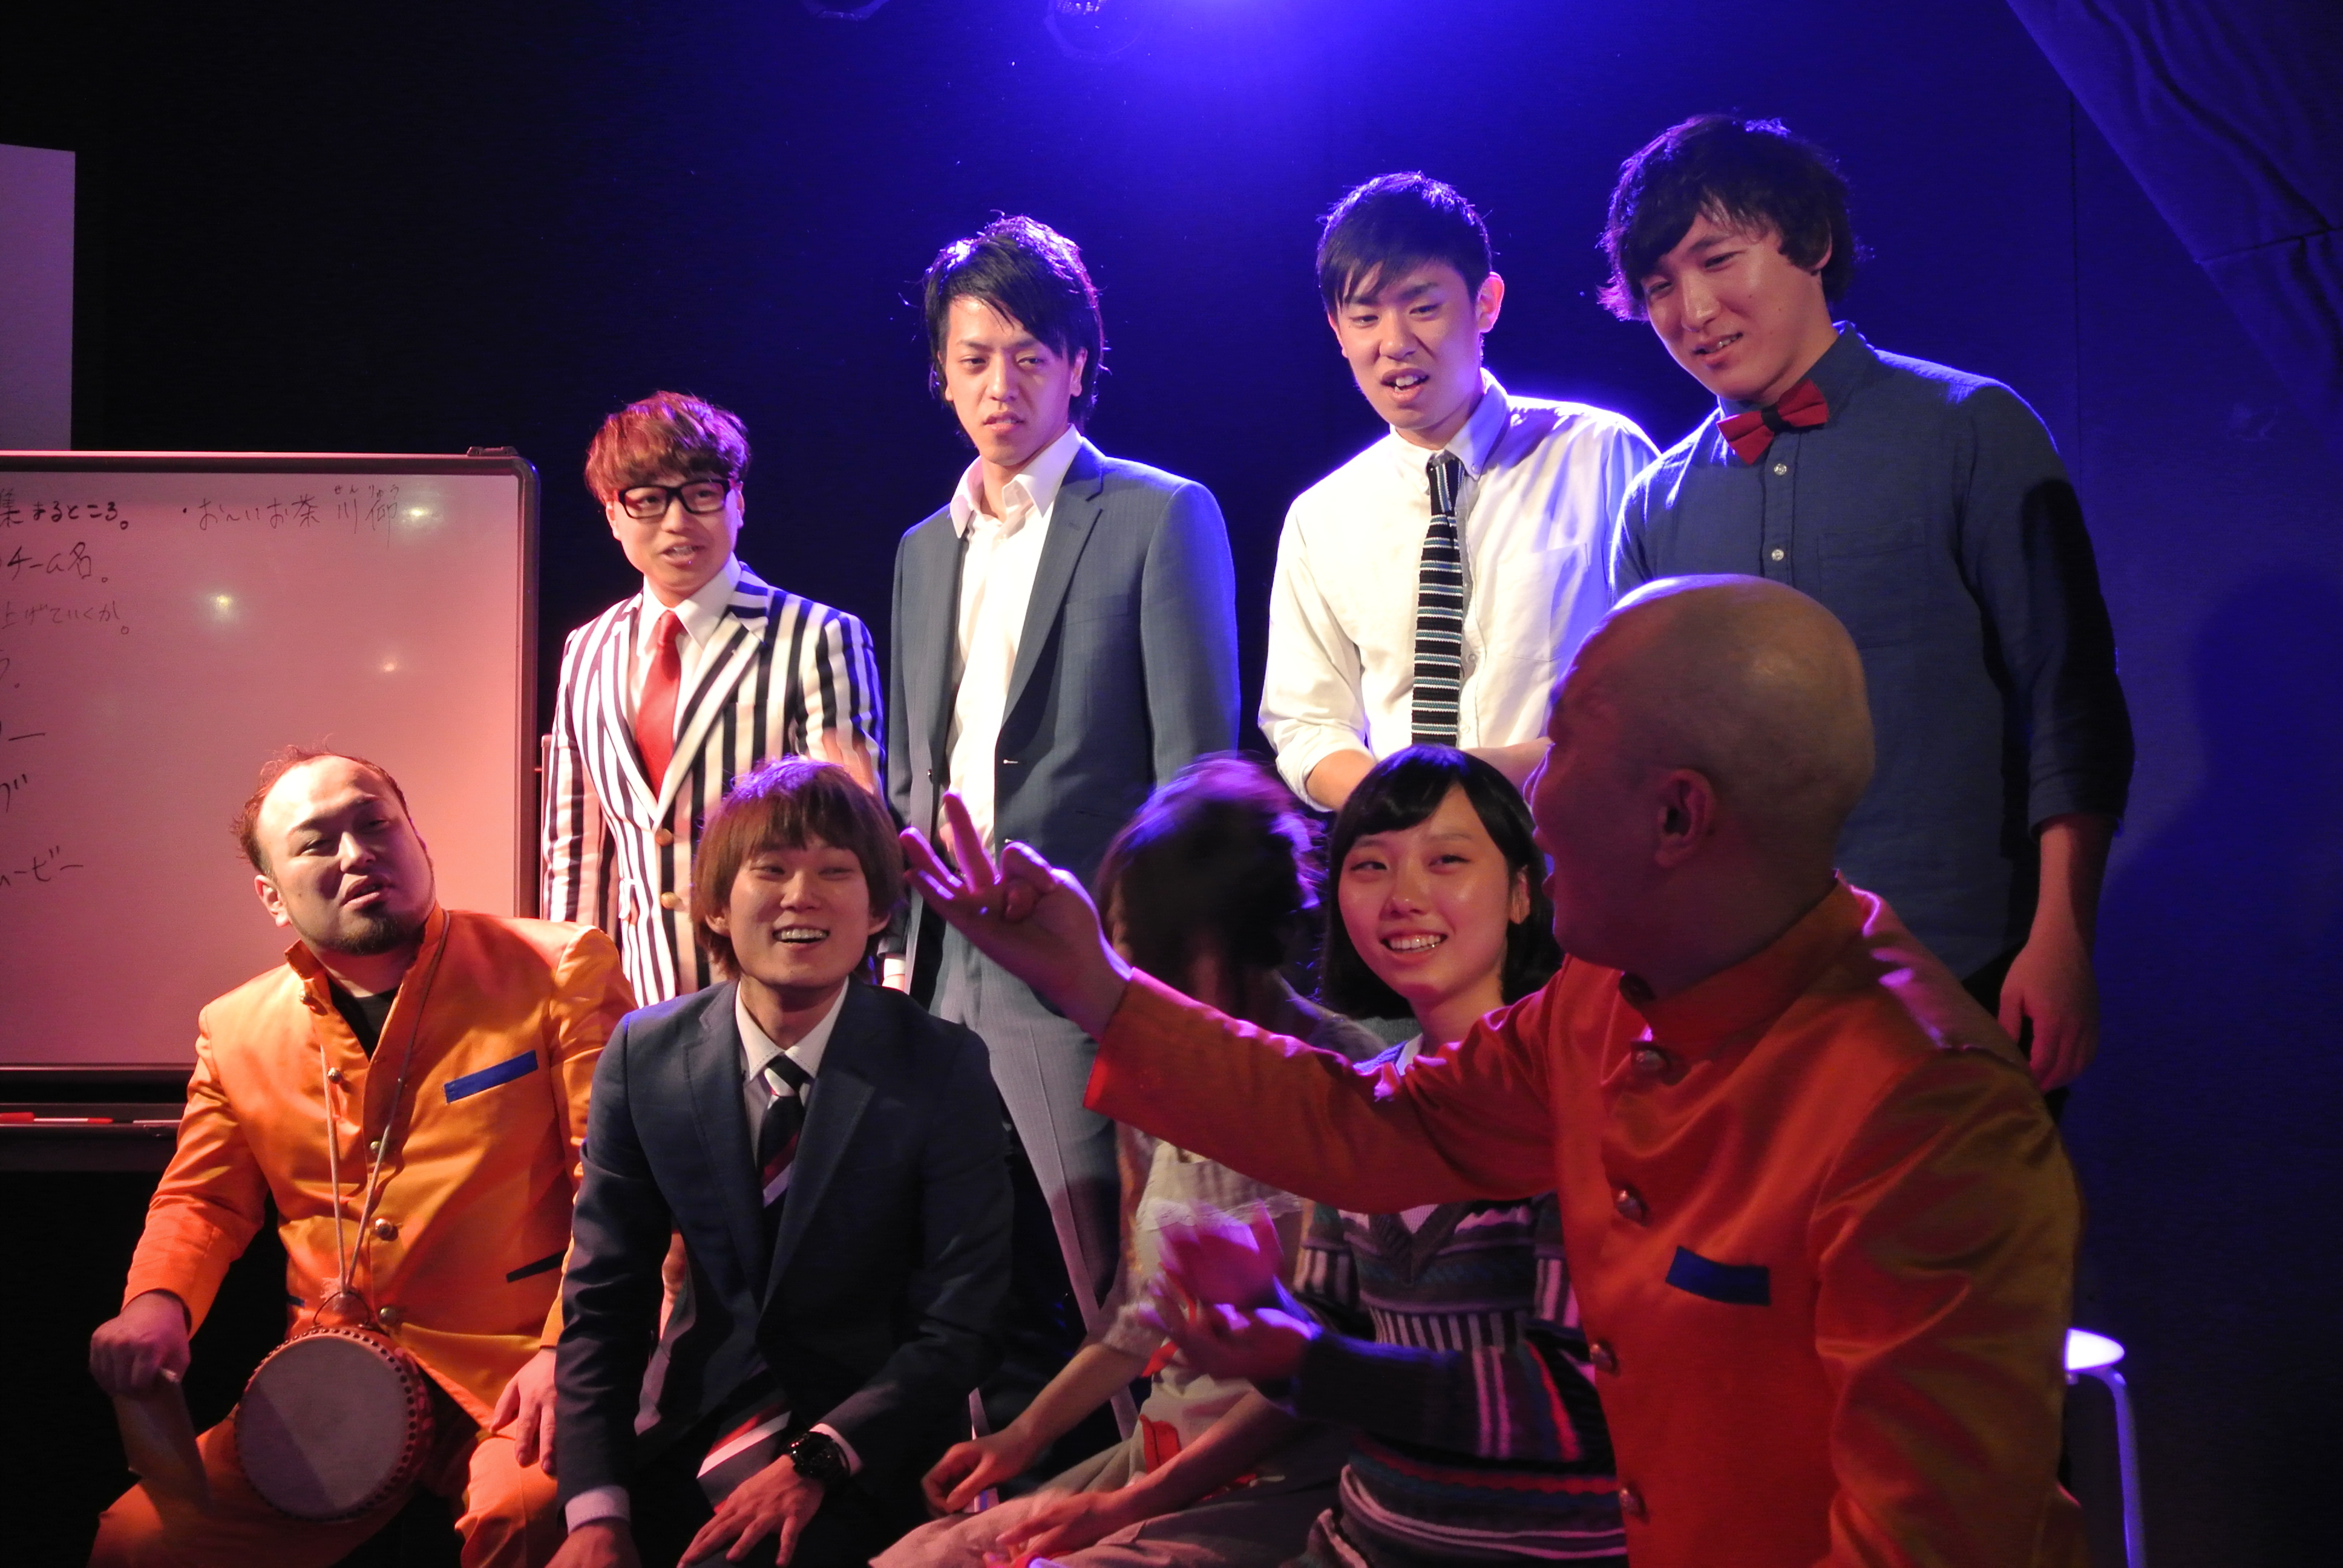 http://news.yoshimoto.co.jp/photos/uncategorized/2014/12/27/20141227231355-15f36100157f64677f8d0b6733b3fafd593e037c.jpg